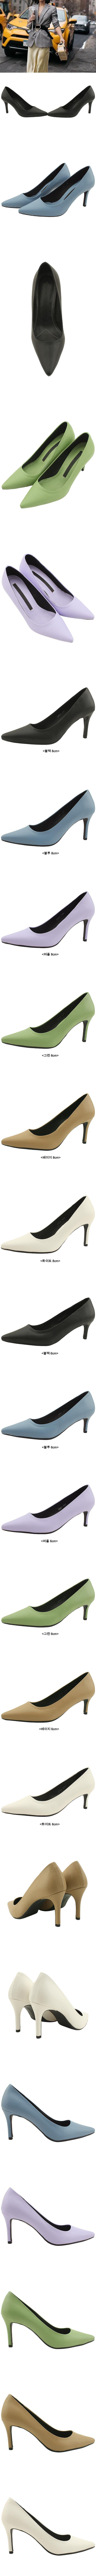 Simple Stiletto High Heels 6cm 8cm Beige